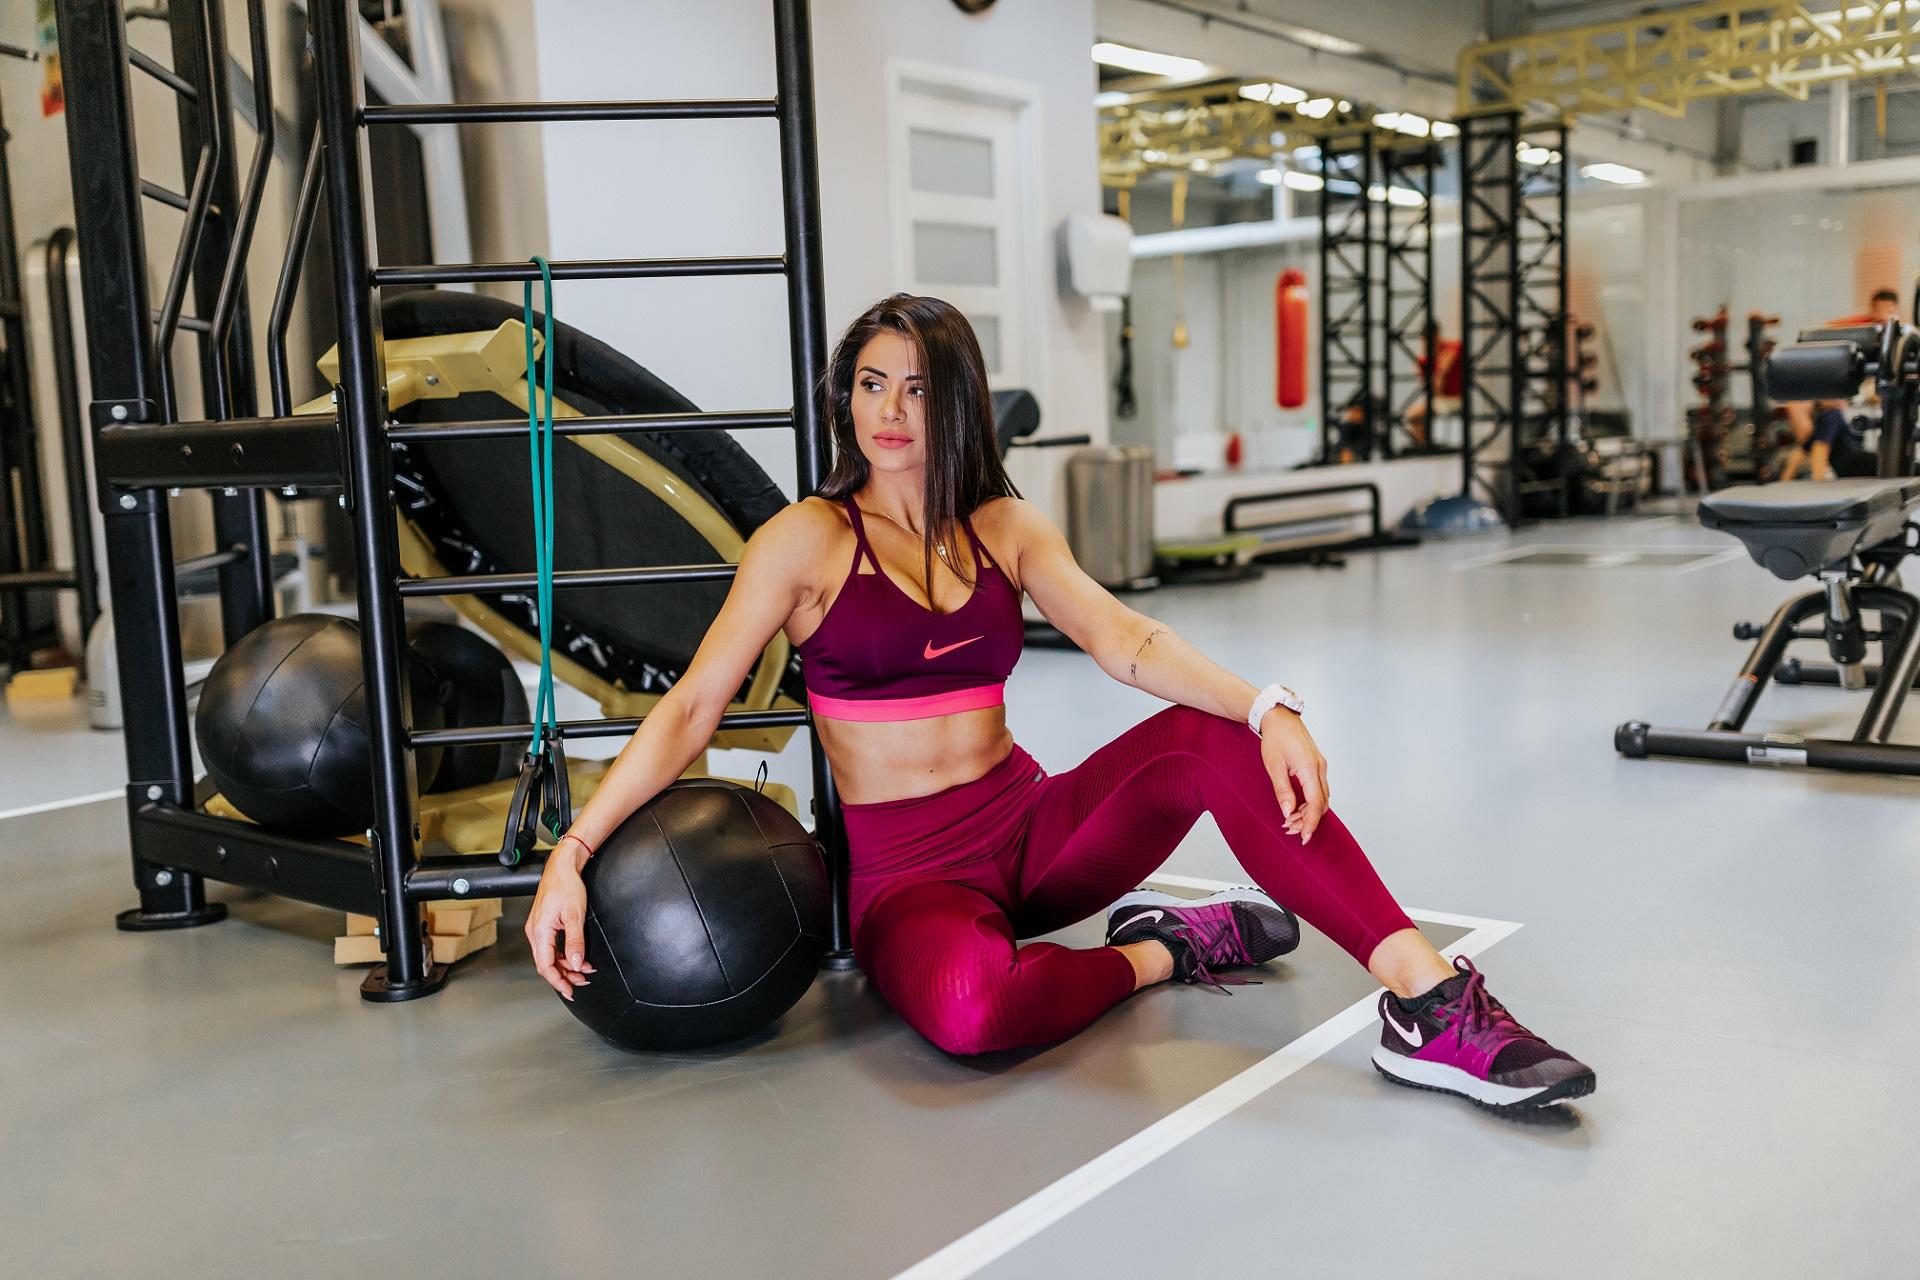 Workout May